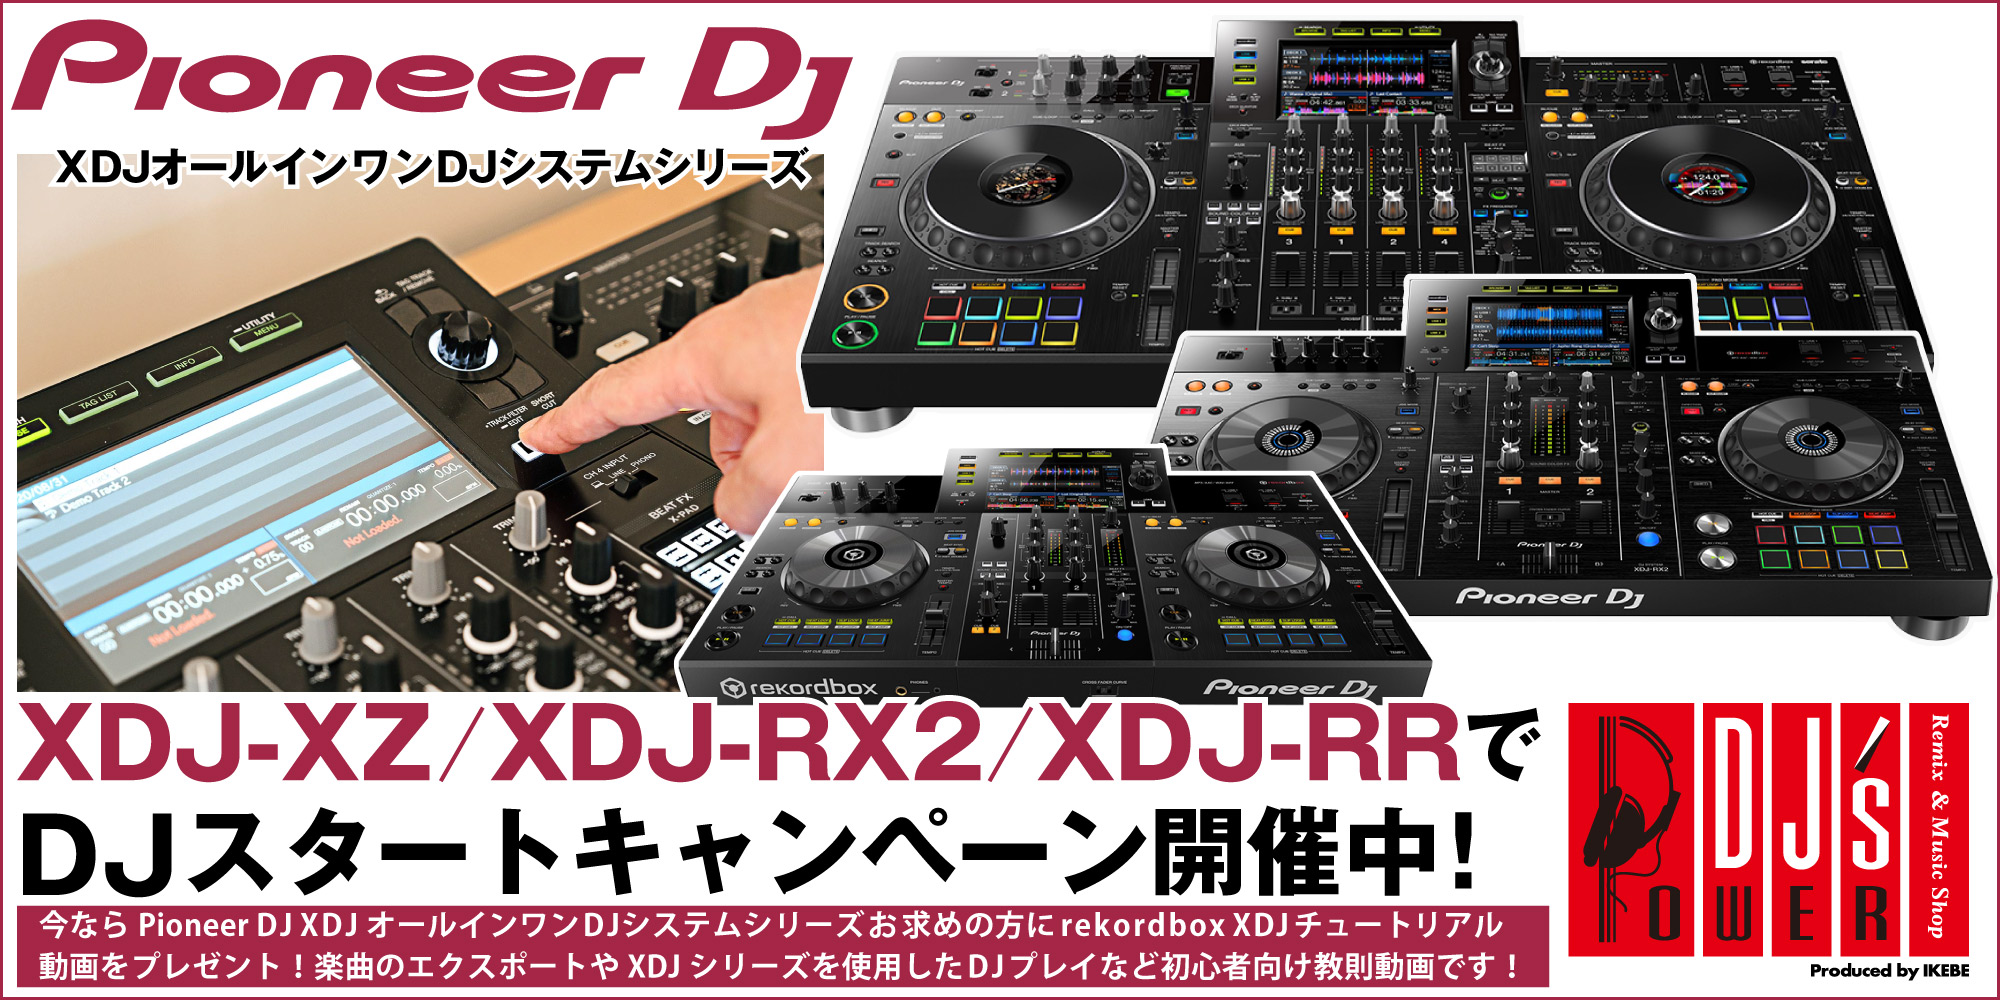 【Pioneer DJ XDJオールインワンDJシステムシリーズ XDJ-XZ/XDJ-RX2/XDJ-RRでDJスタートキャンペーン開催中!】